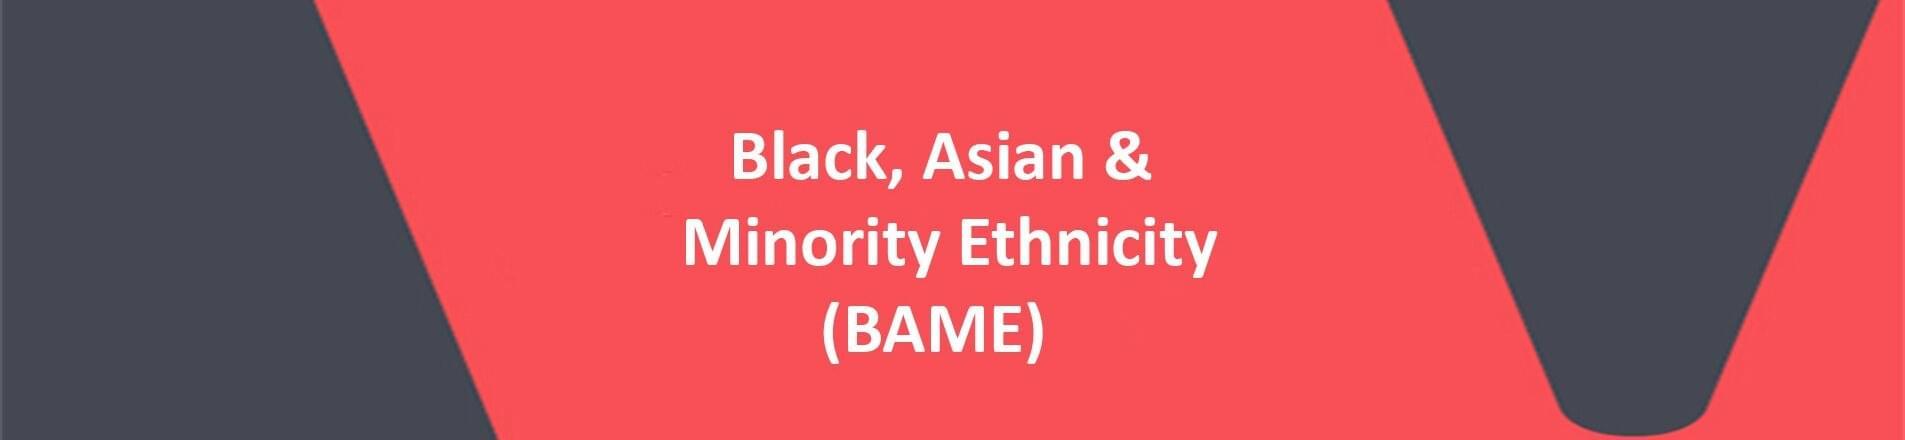 Black, Asian & Minority Ethnicity (BAME).